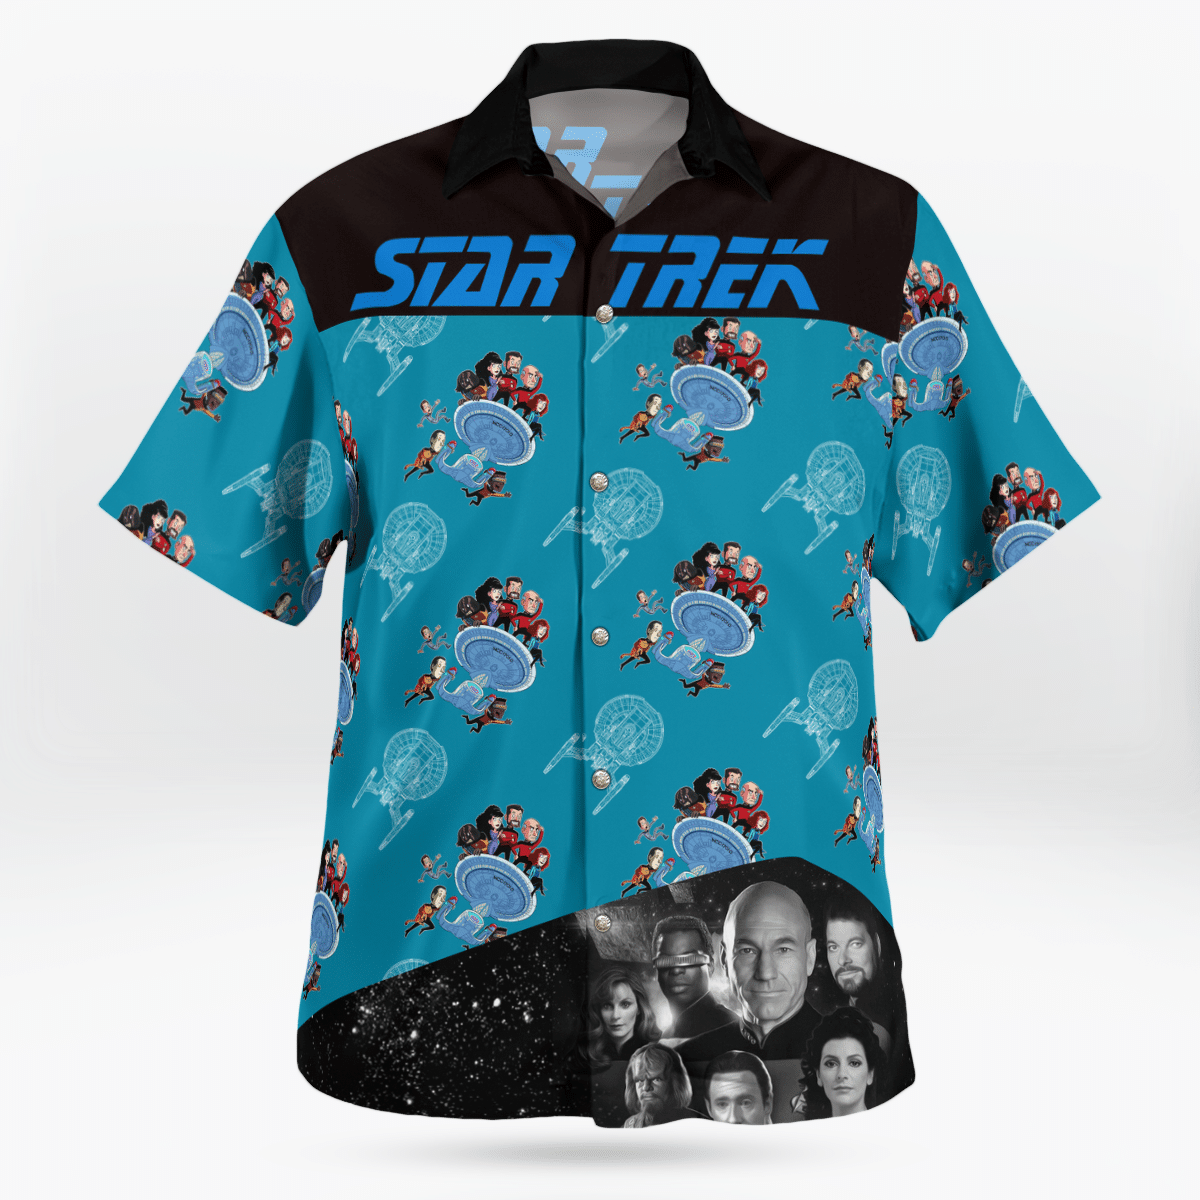 Star Trek The next generation Hawaiian shirt - LIMITED EDITION